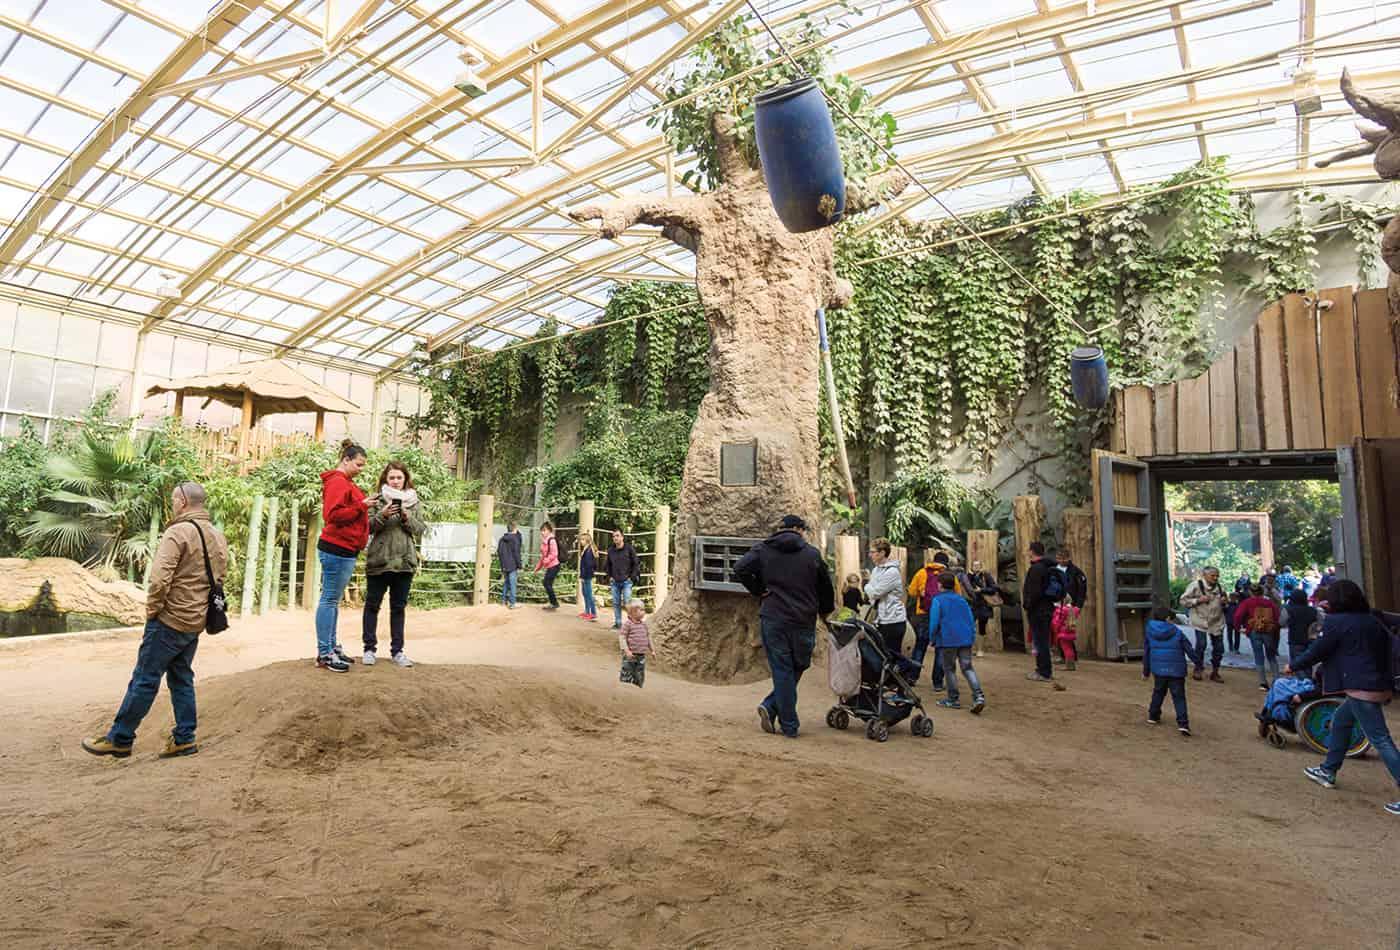 Sesam öffne dich im Zoo 2017 (Foto: Peter Bastian/Zoo Heidelberg)